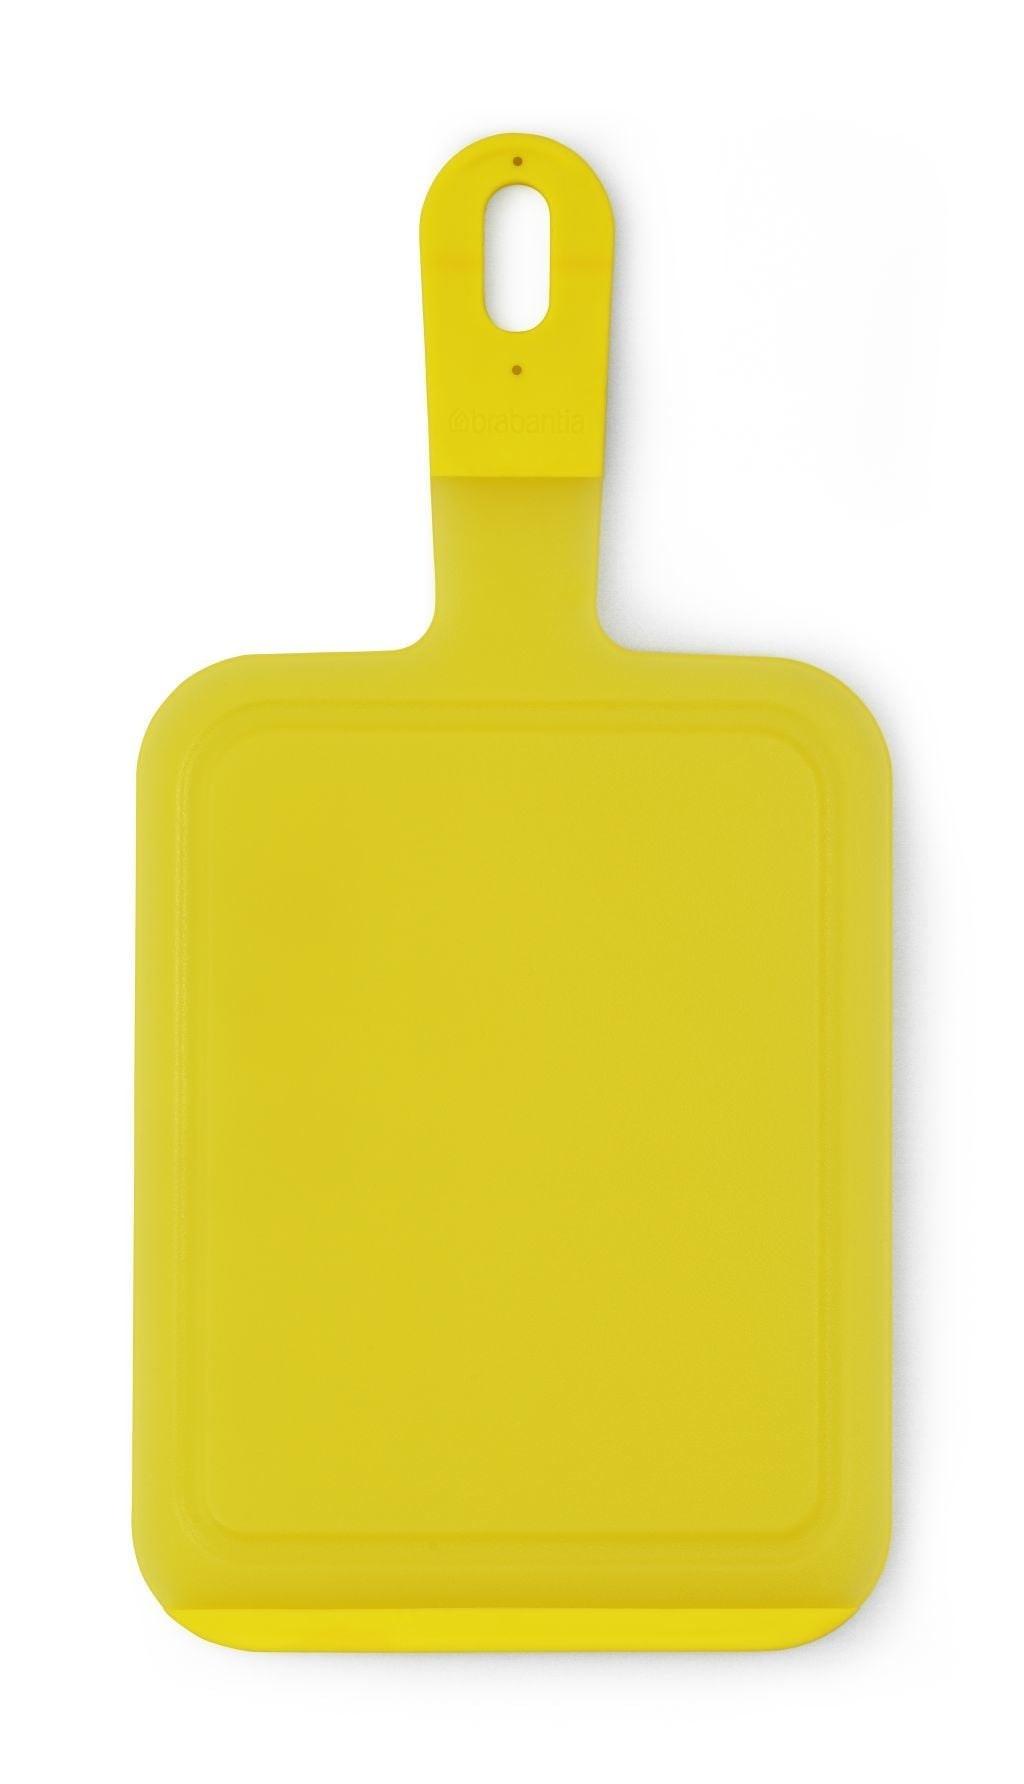 Brabantia Snijplank S Yellow